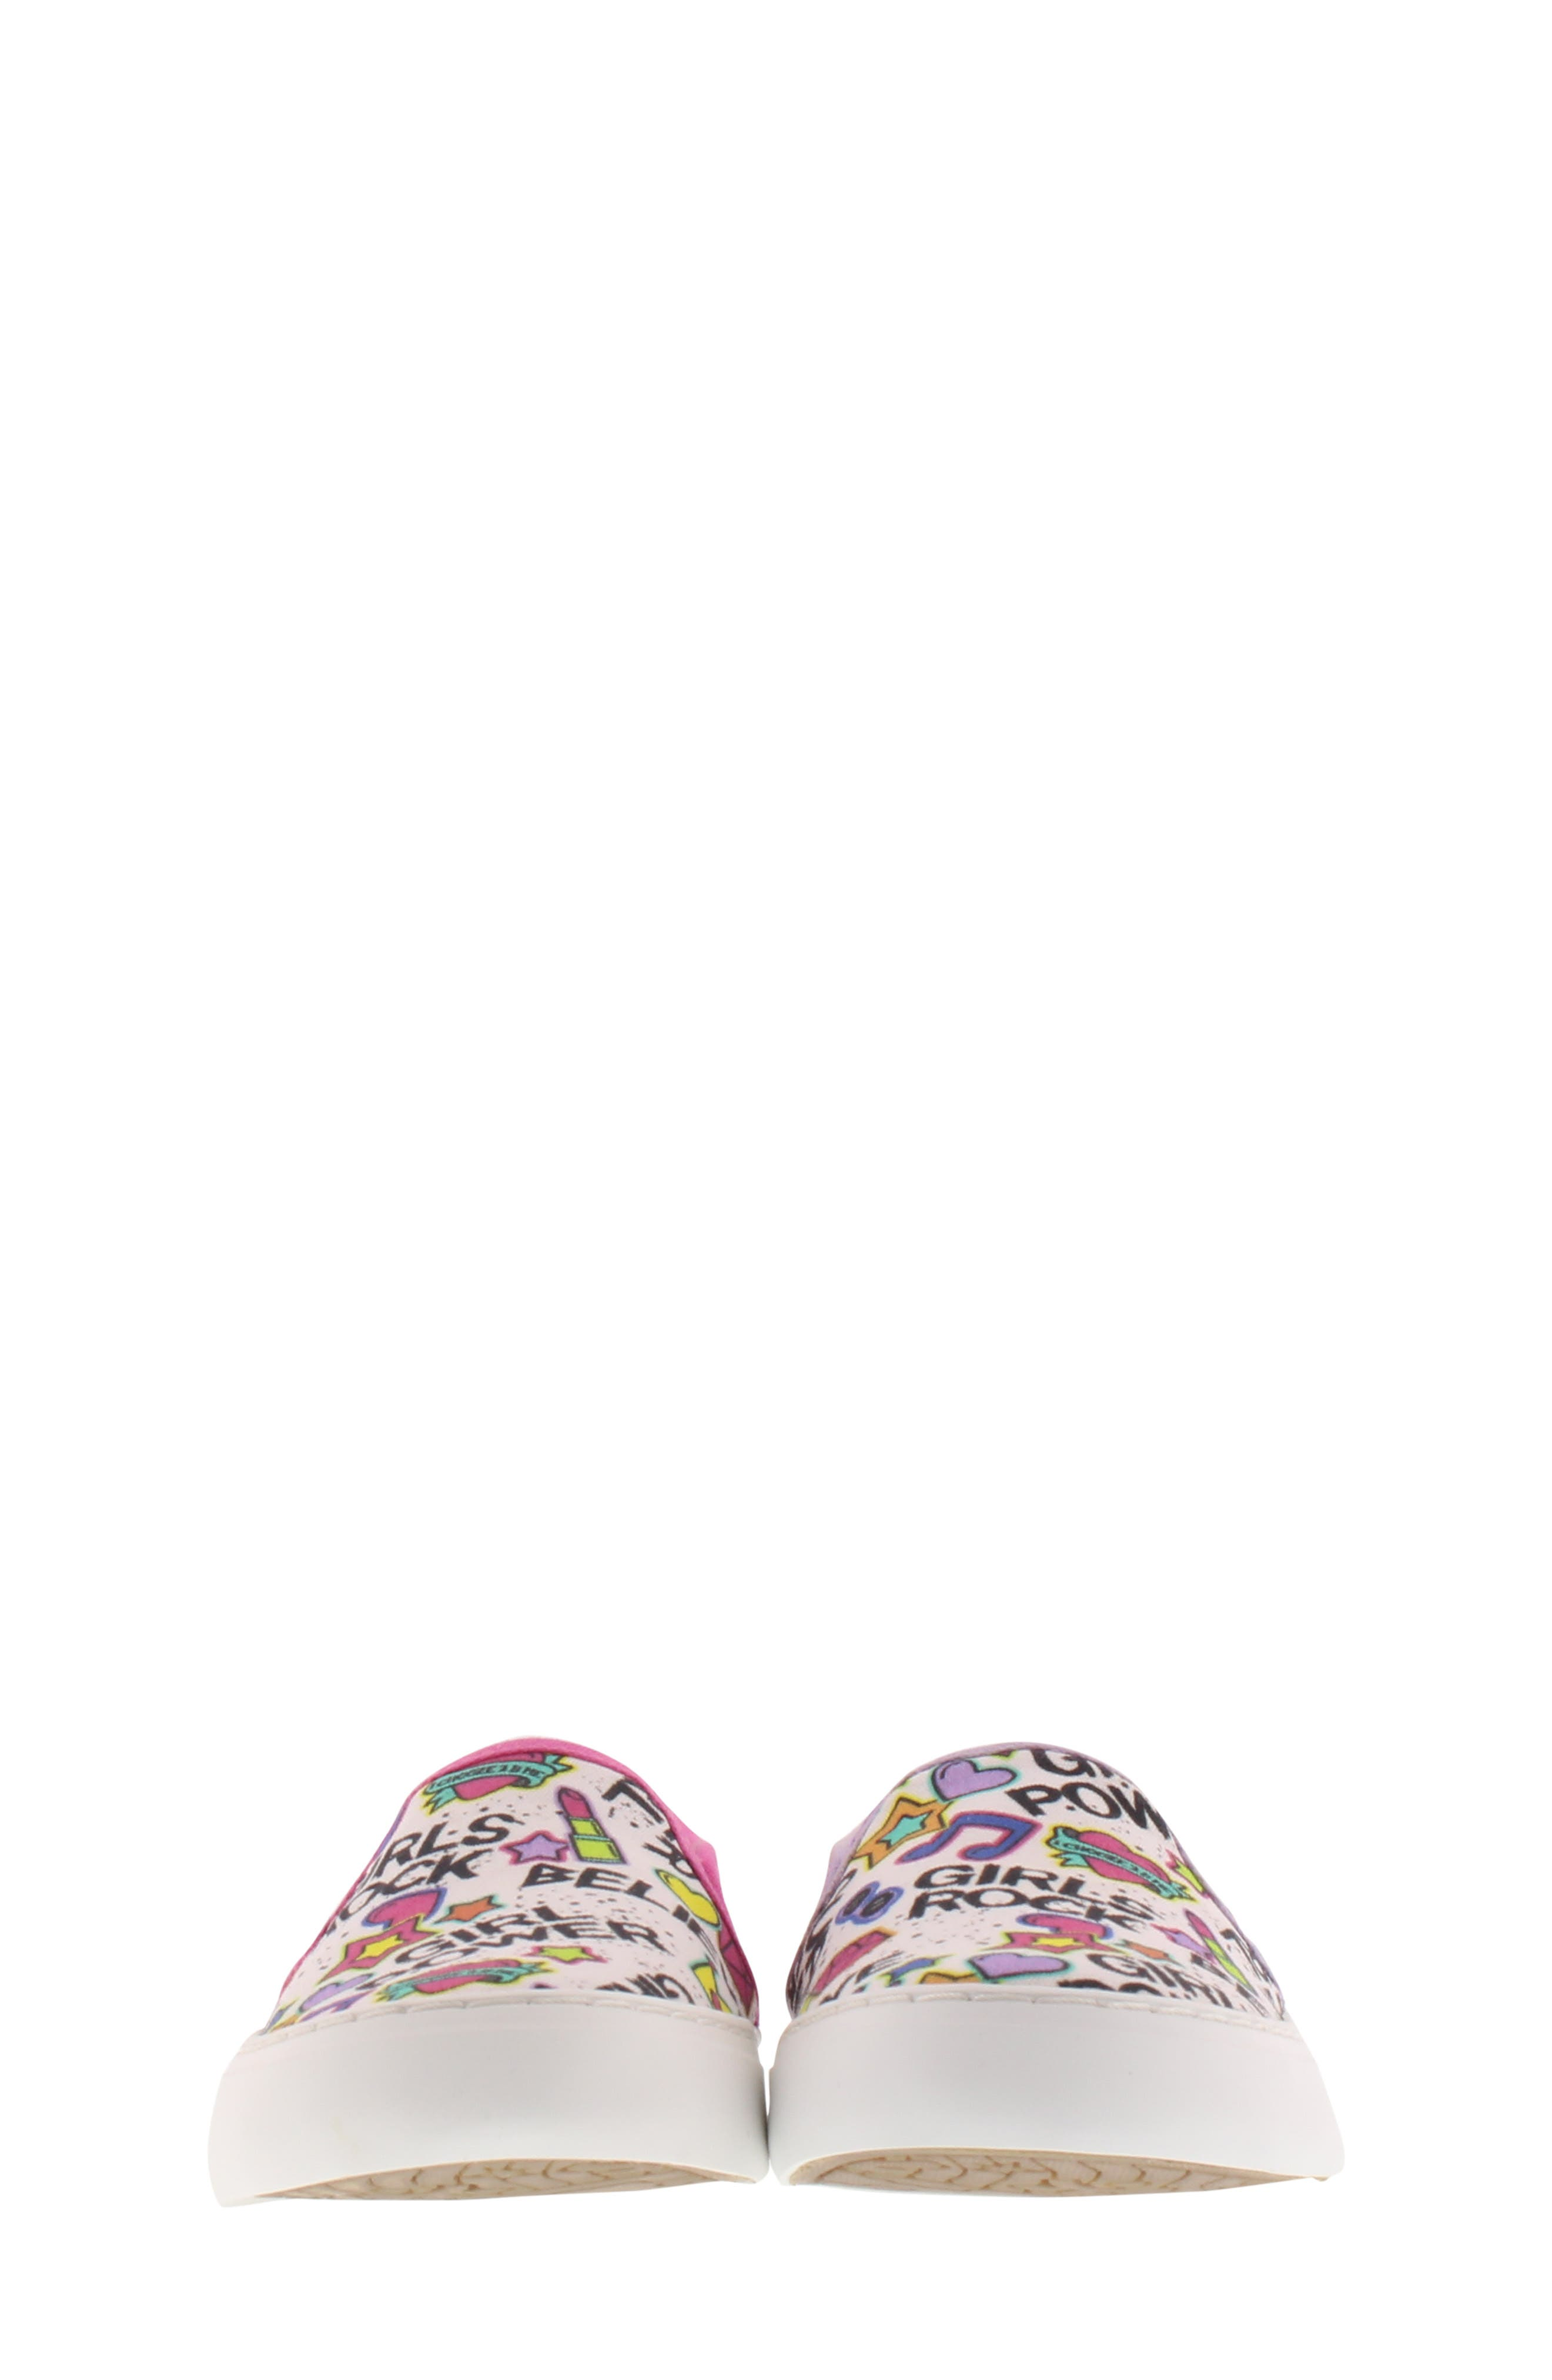 CHOOZE, Move Motion Slip-On Sneaker, Alternate thumbnail 4, color, PINK LAVENDER